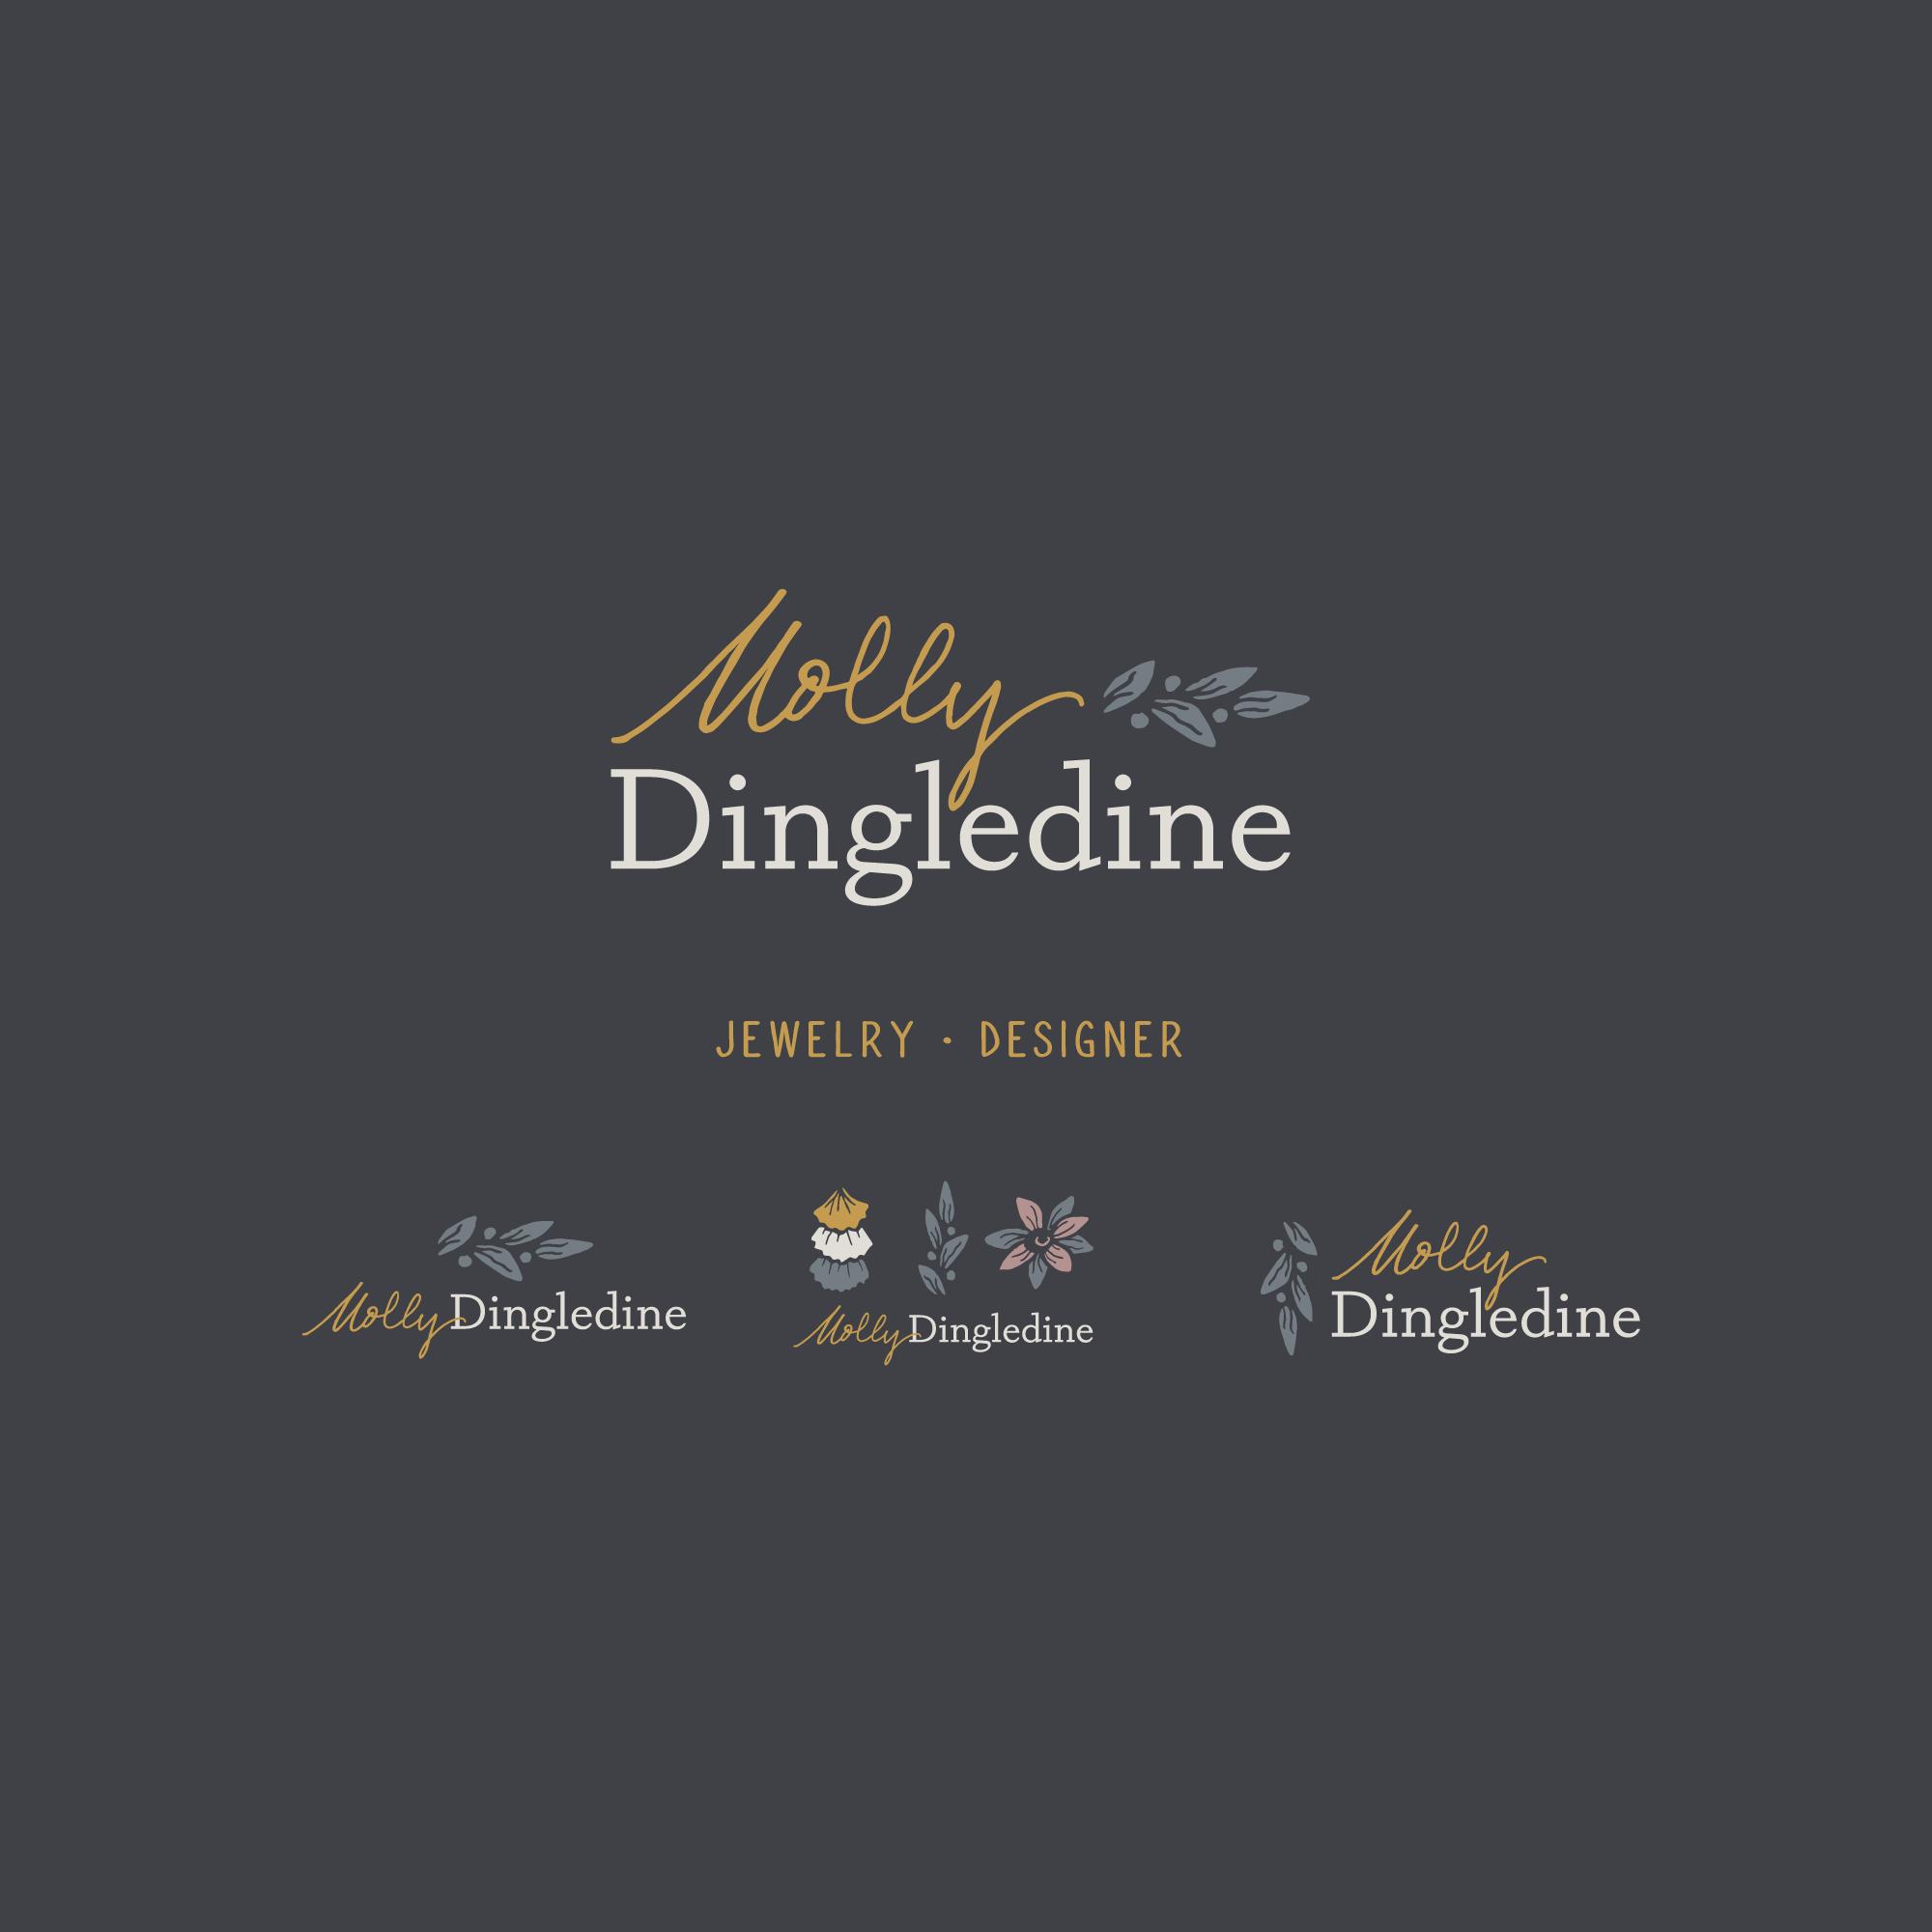 Branding for a Jewelry Designer logomark typography type designer jewelry organic leaf branding brand logos logo signature